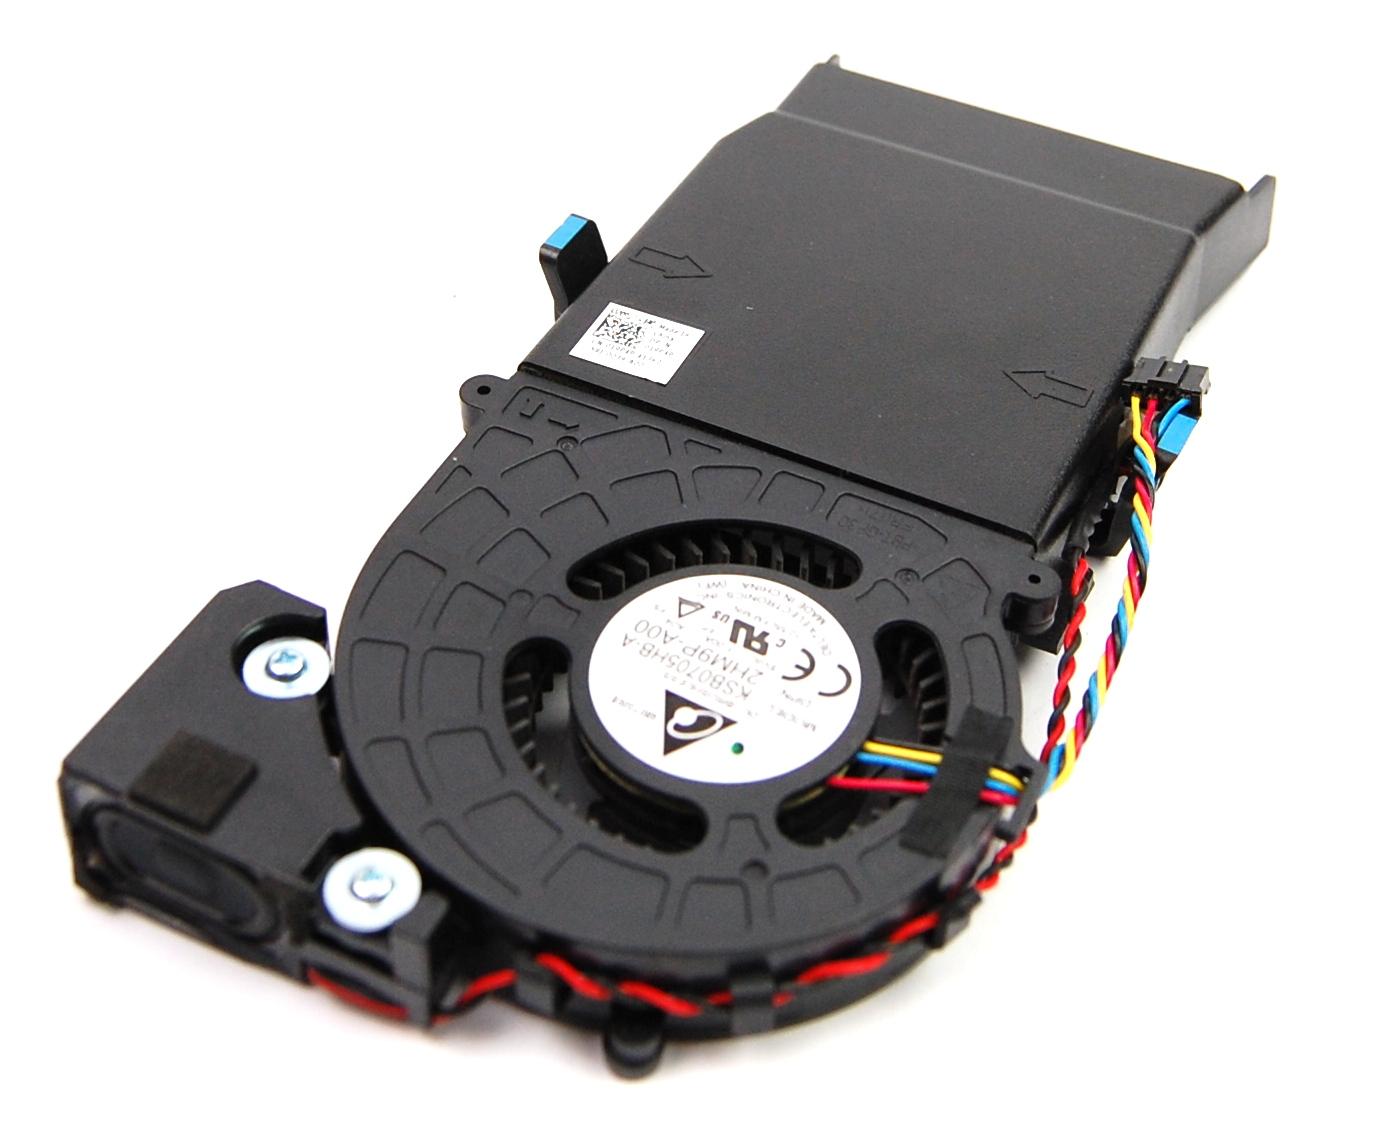 Dell 19P4P 2HM9P KG9KP Optiplex 3020m Heatsink Shroud Cover, Fan & Speaker Assem